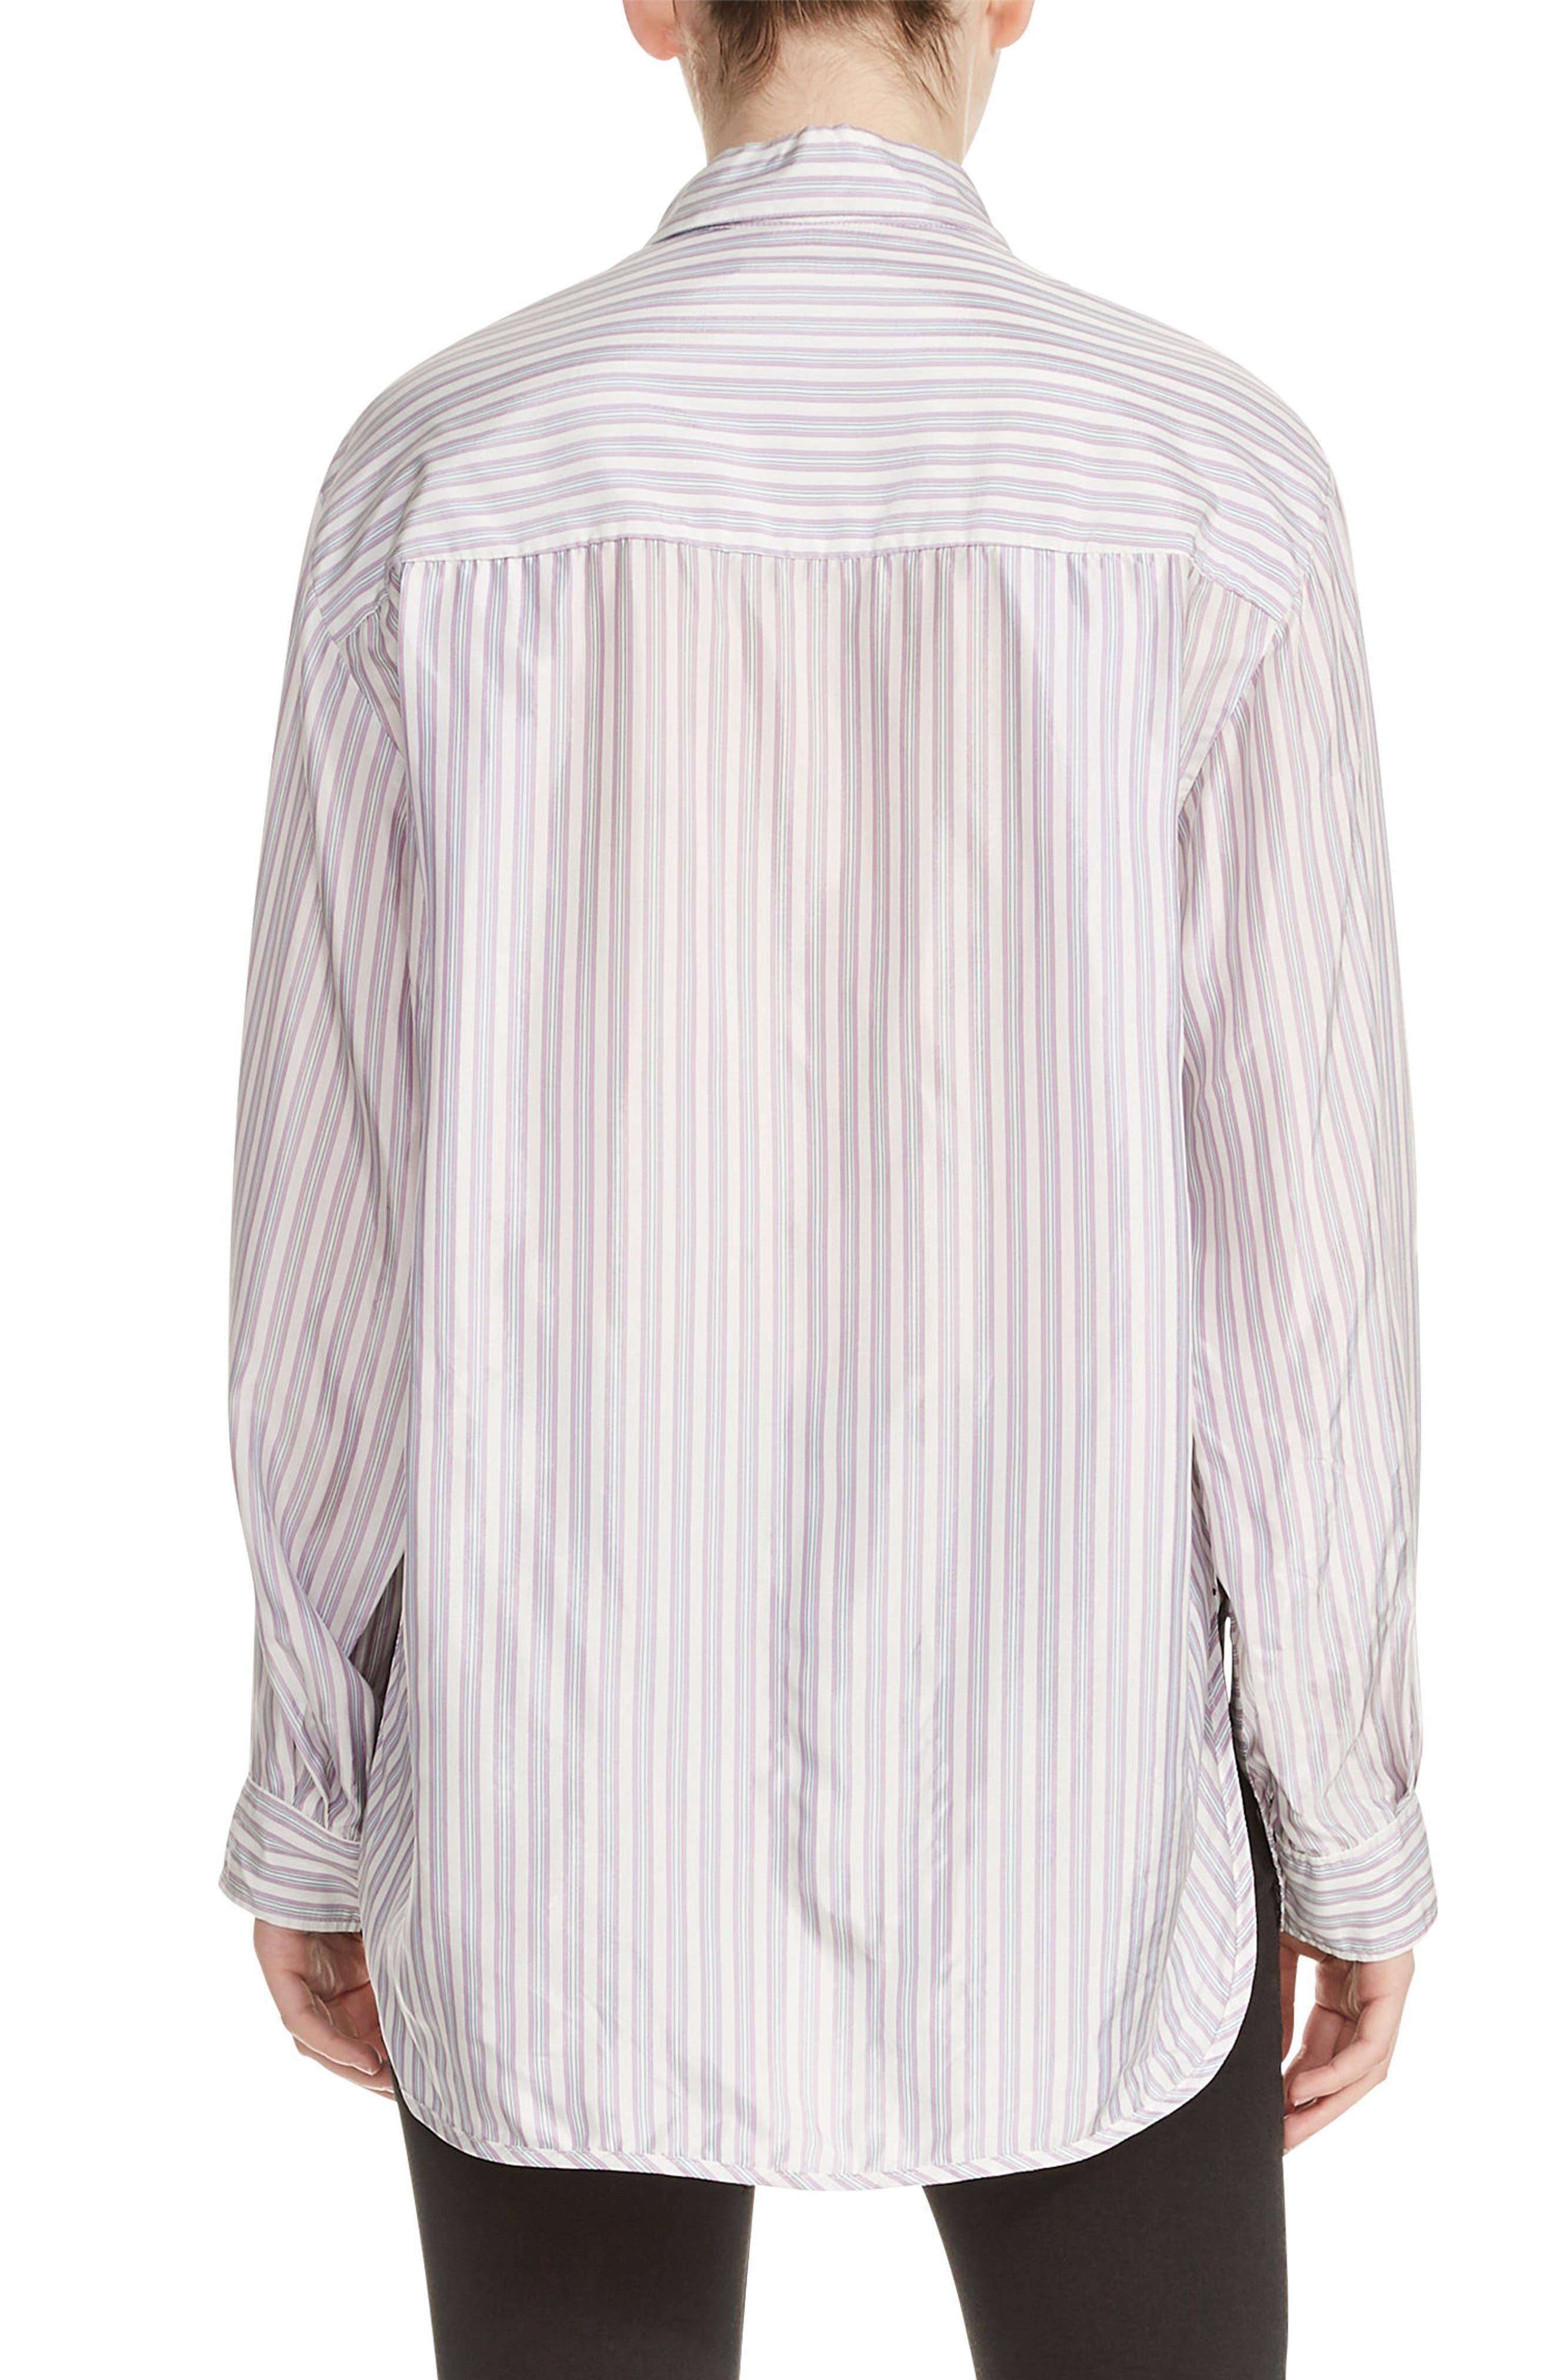 Celina High/Low Stripe Blouse,                             Alternate thumbnail 2, color,                             100